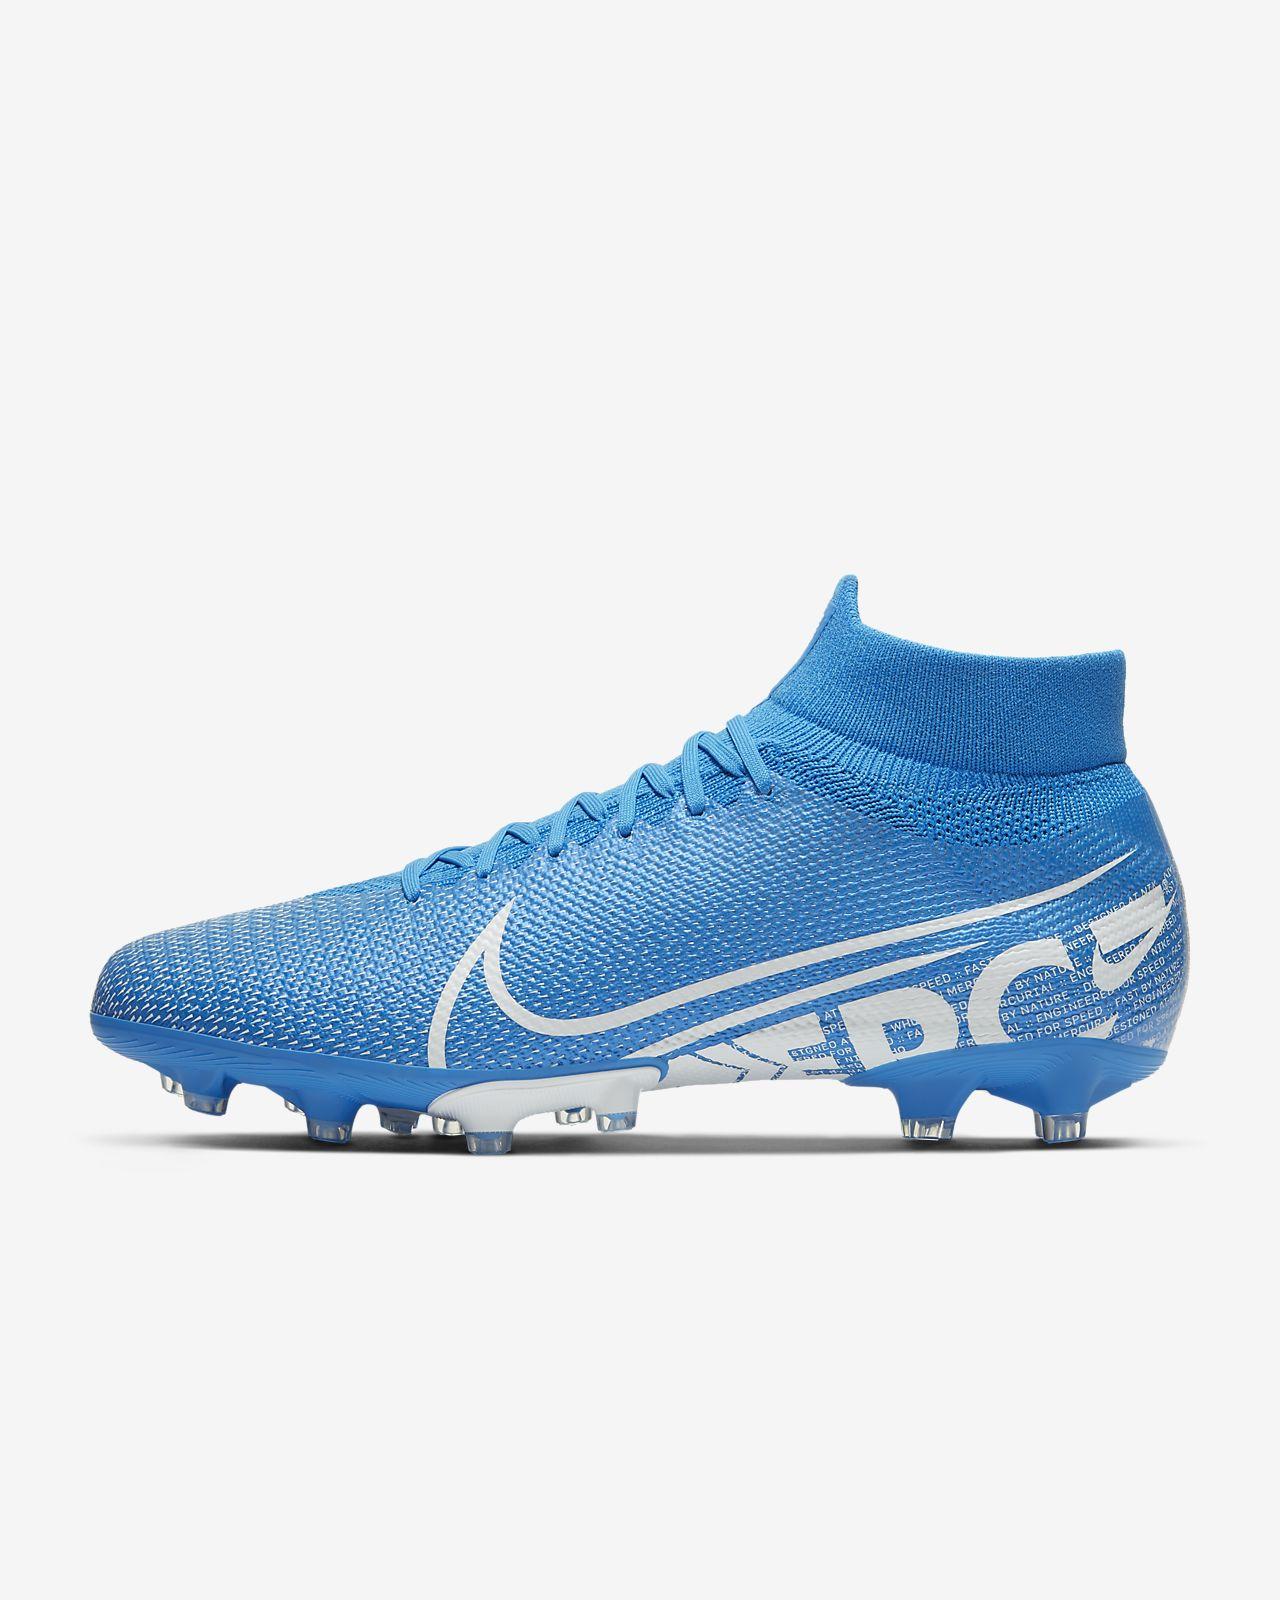 Calzado de fútbol para césped artificial Nike Mercurial Superfly 7 Pro AG PRO